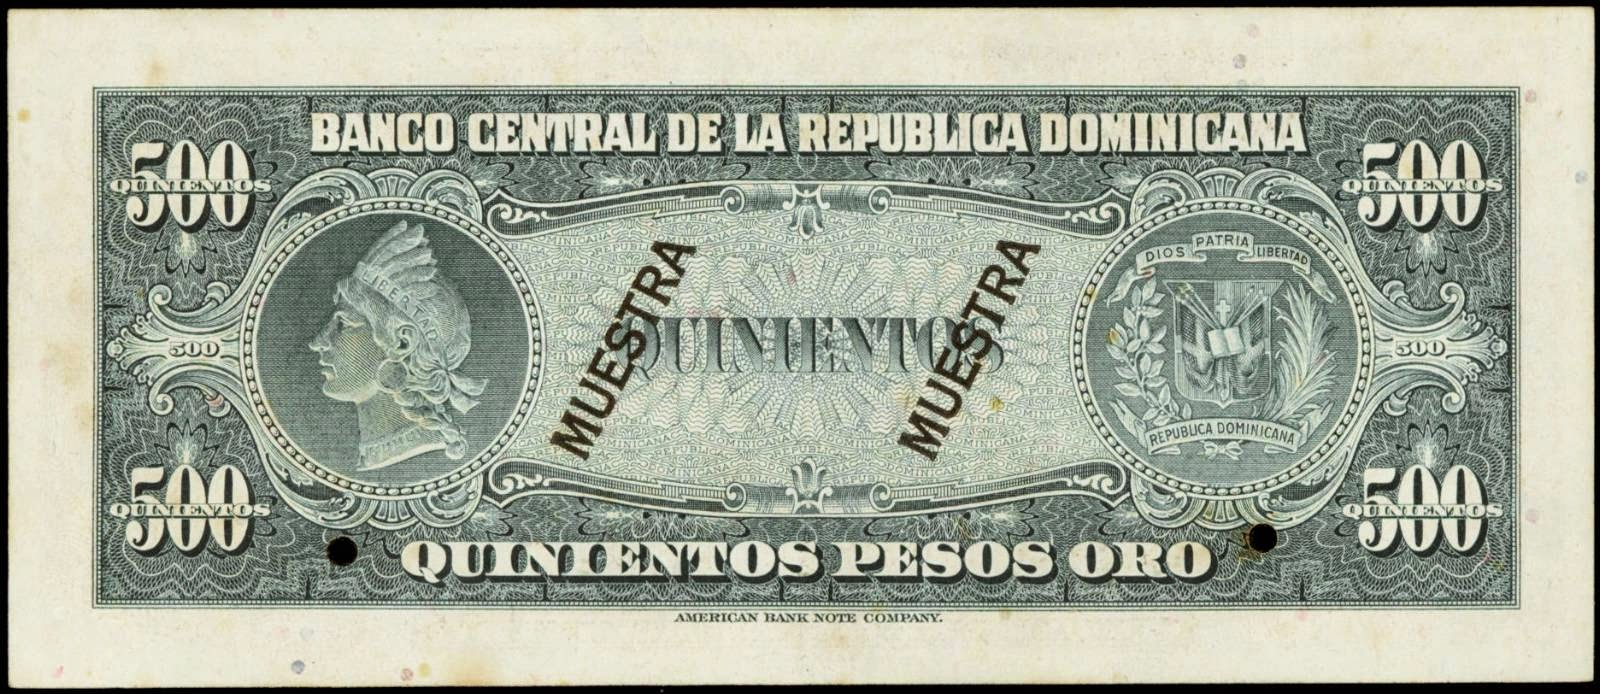 Dominican Republic paper money 500 Pesos Oro banknote 1962